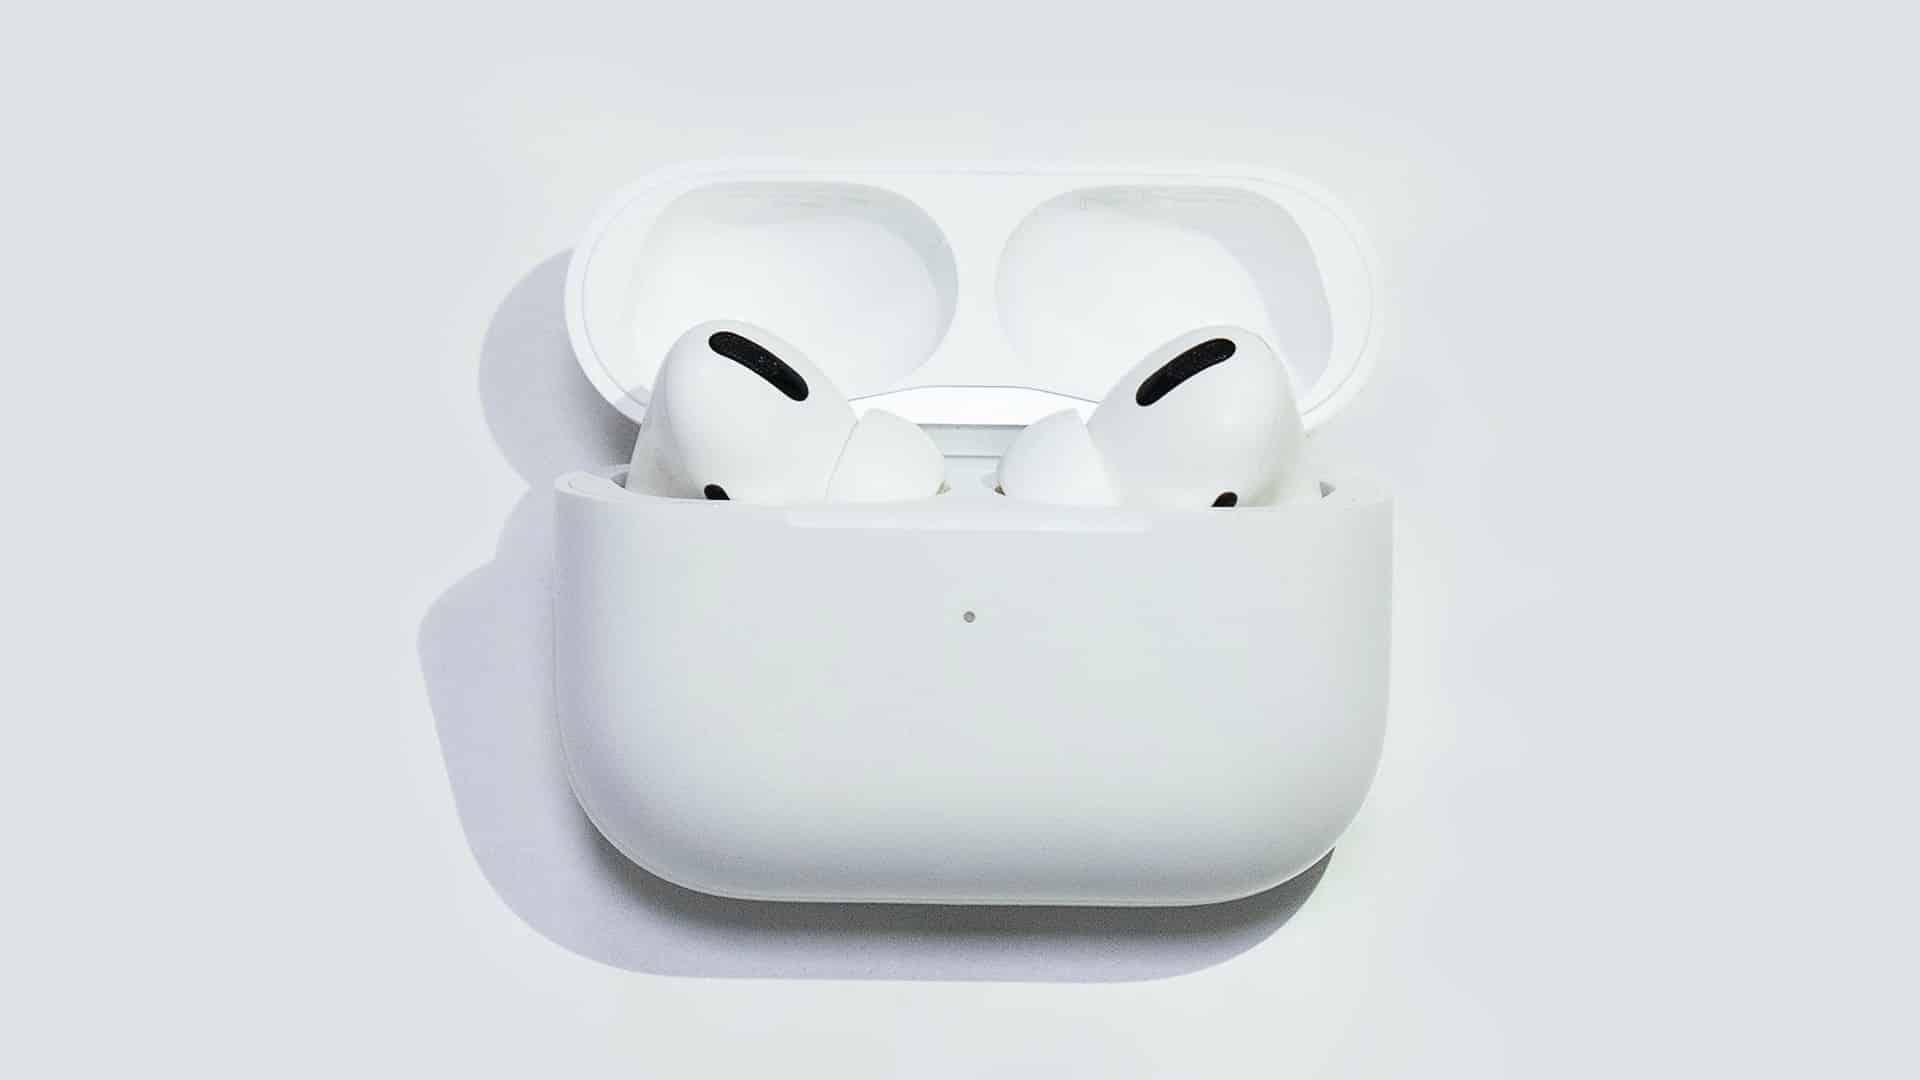 nova generacia apple airpods